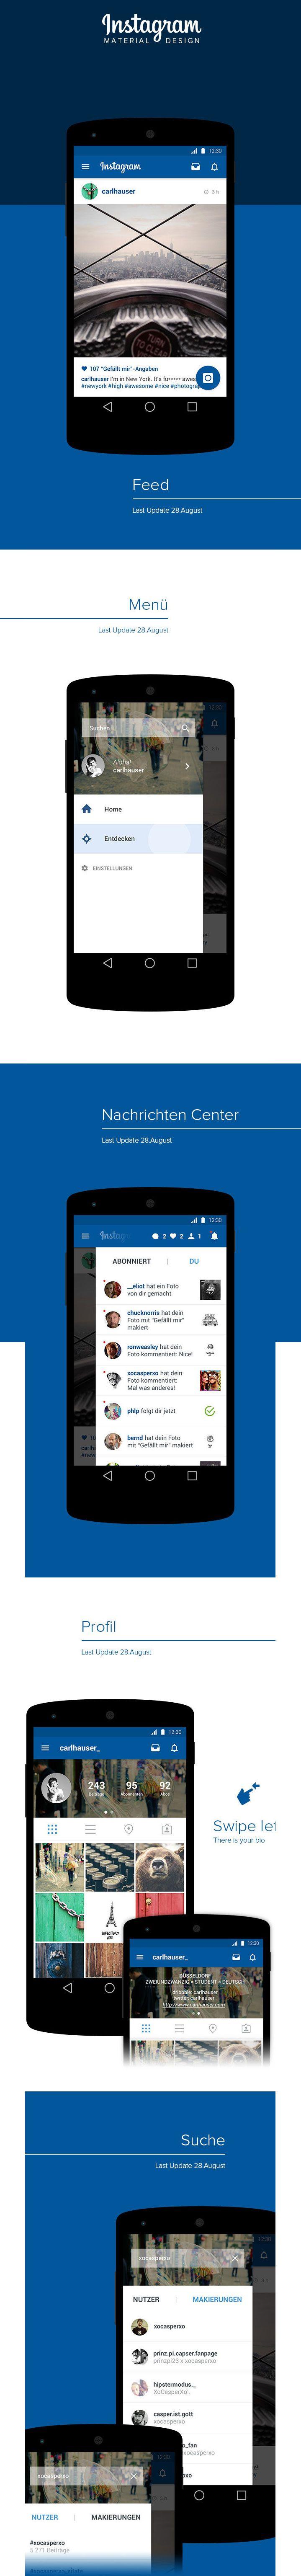 Instagram | Material Design Redesign android